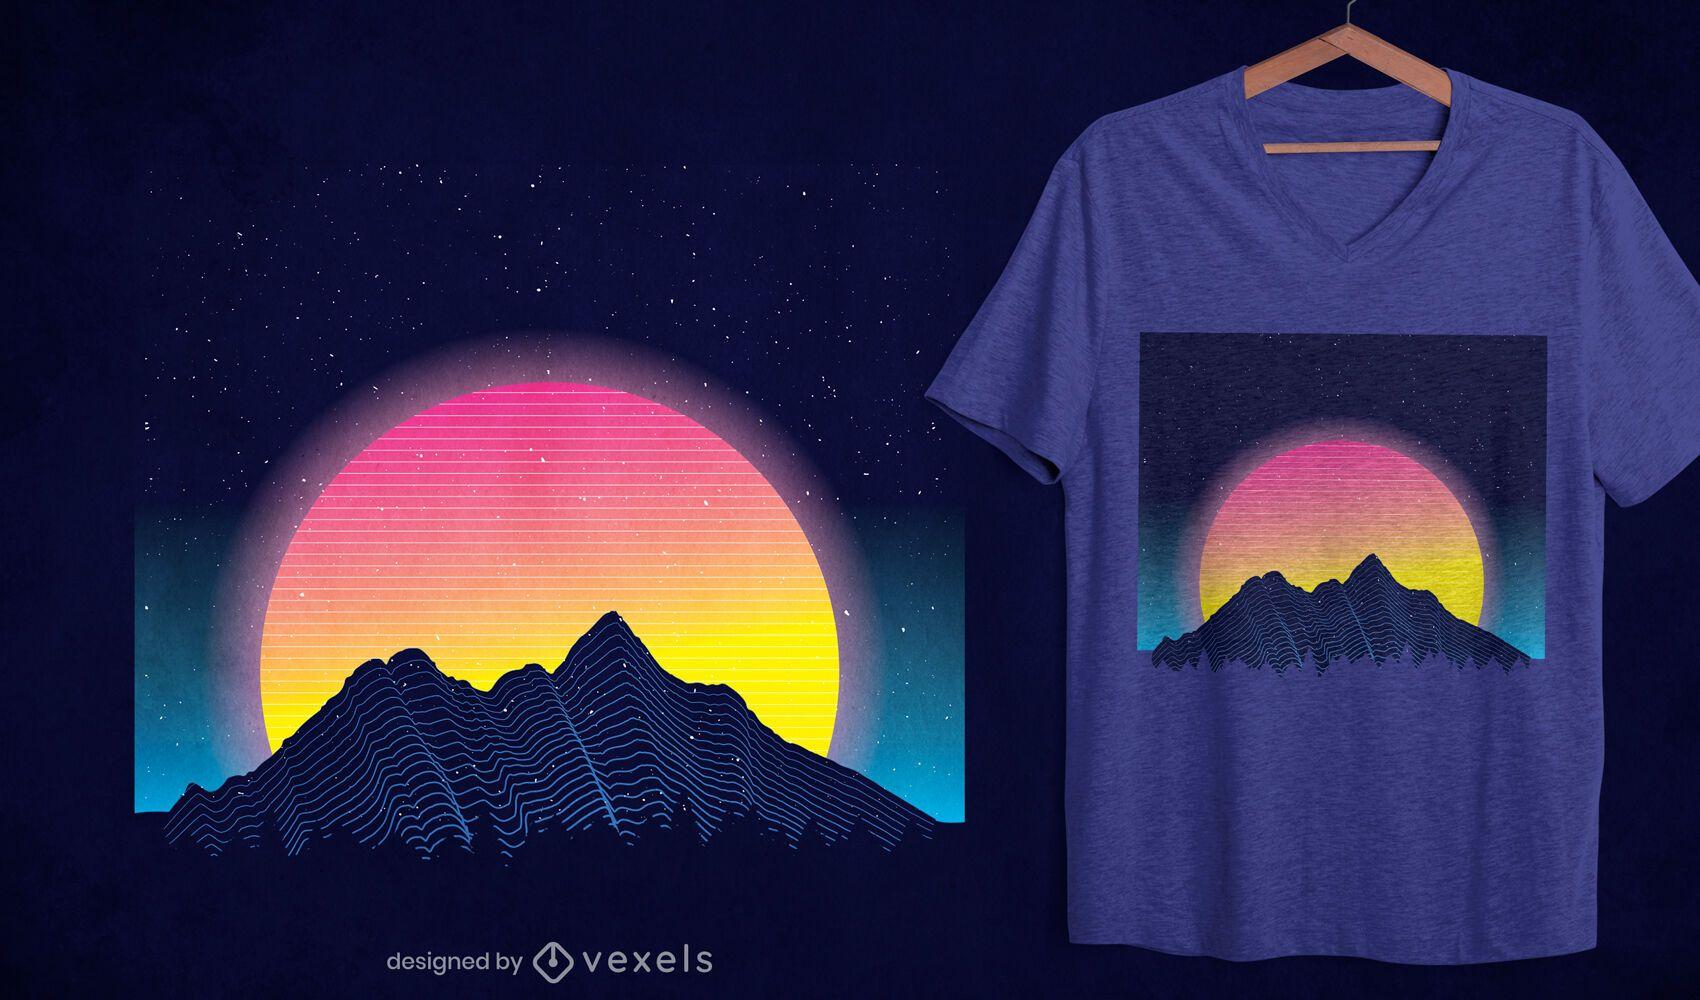 Retrowave mountains t-shirt design